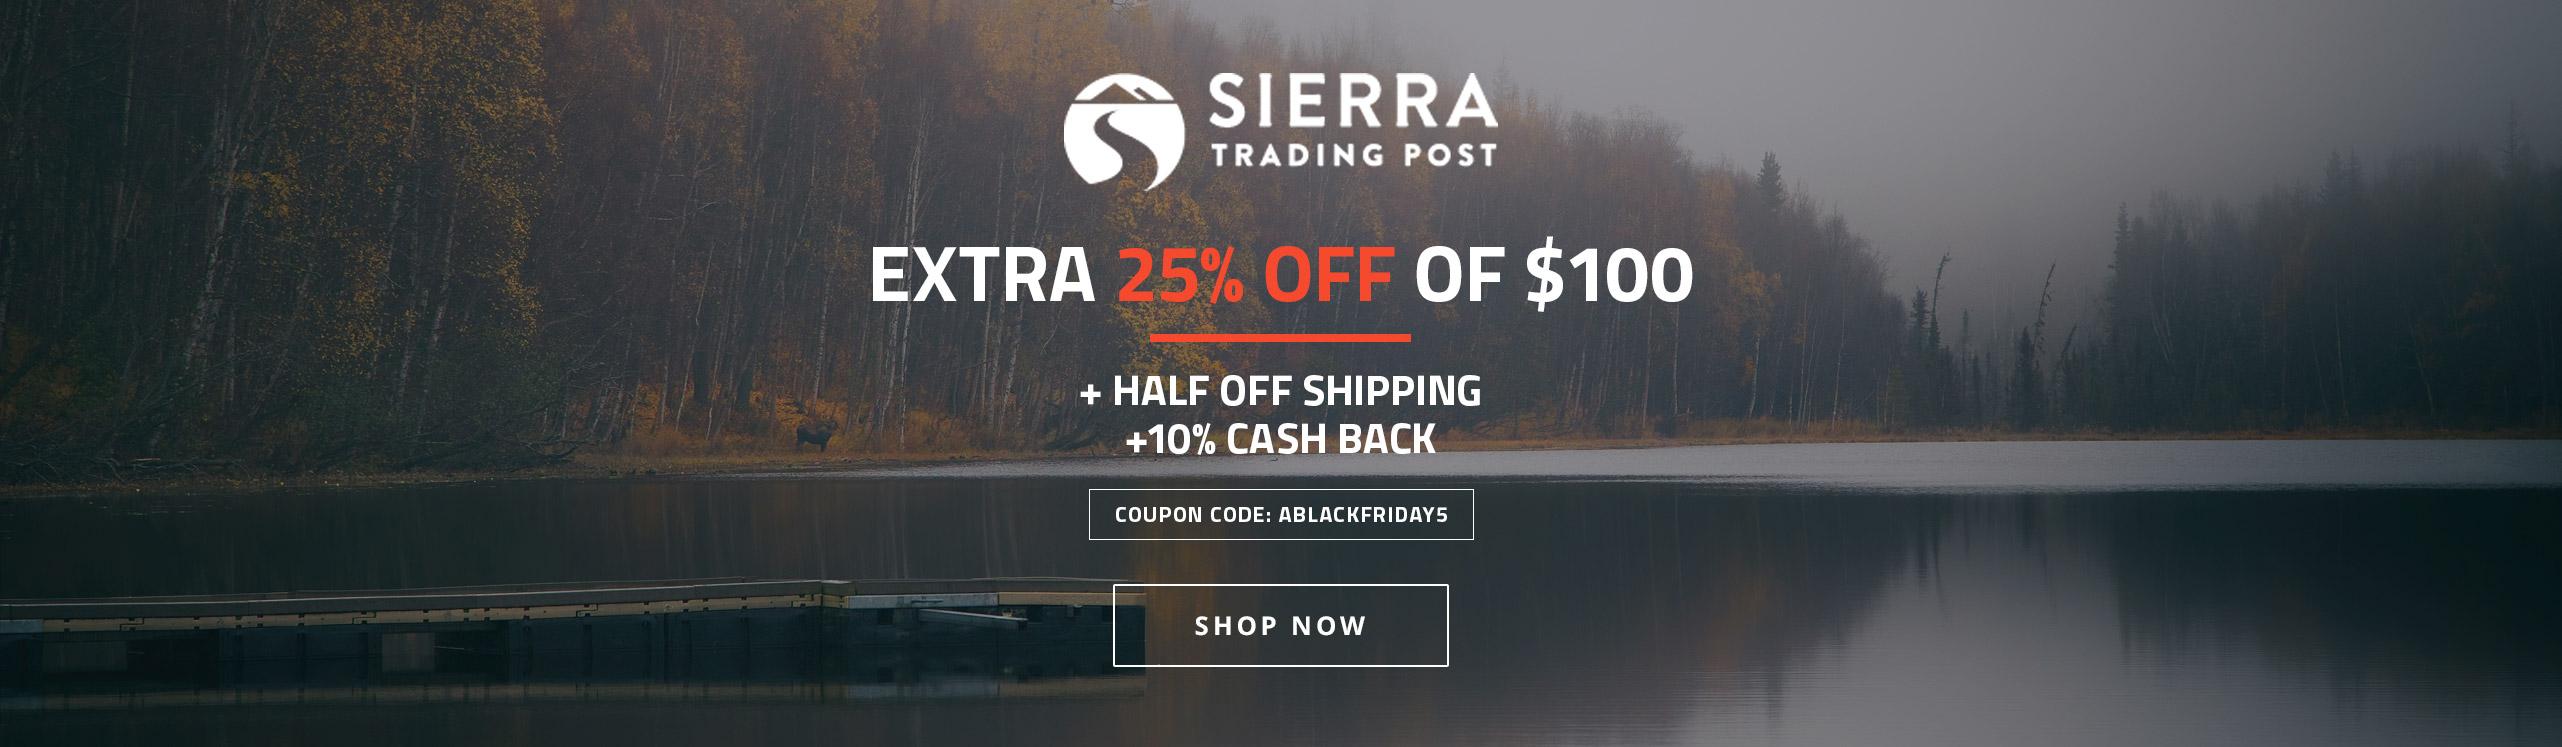 Sierra Trading Post Black Friday